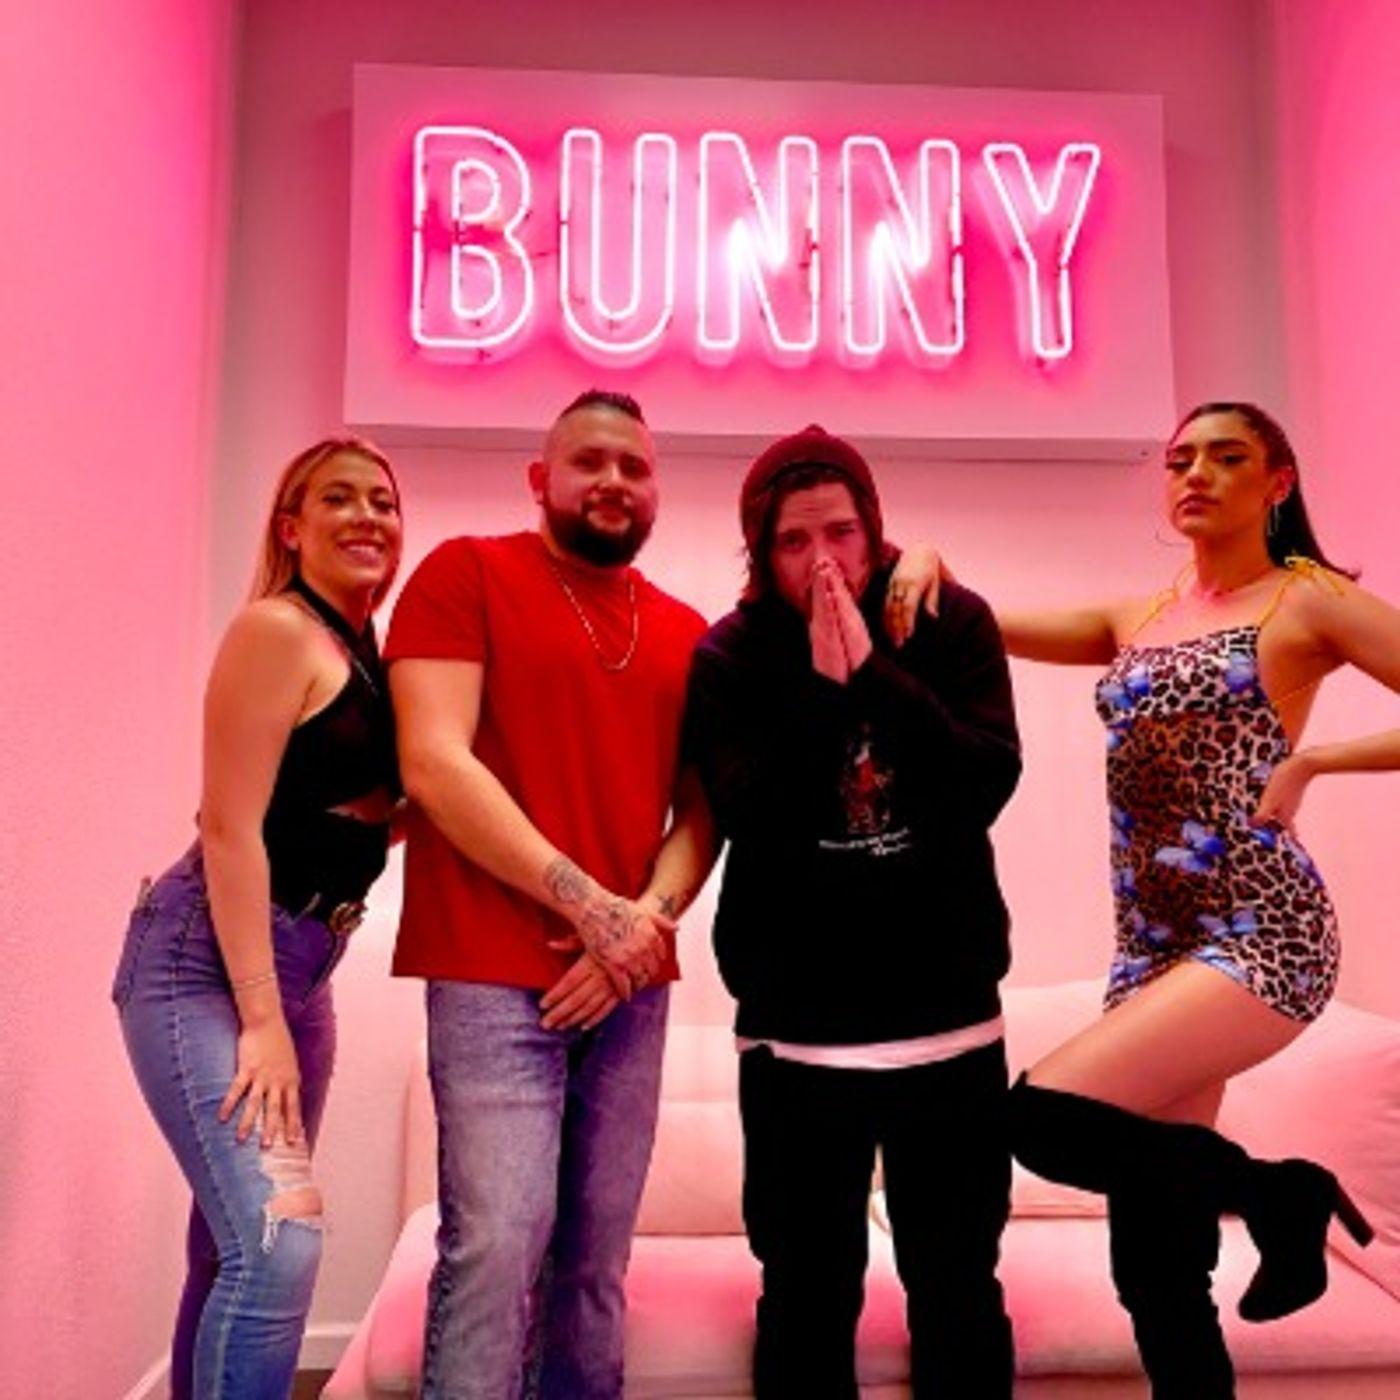 Butt Play and Body Shots feat. @naomi_iswonderland & @krissannaa